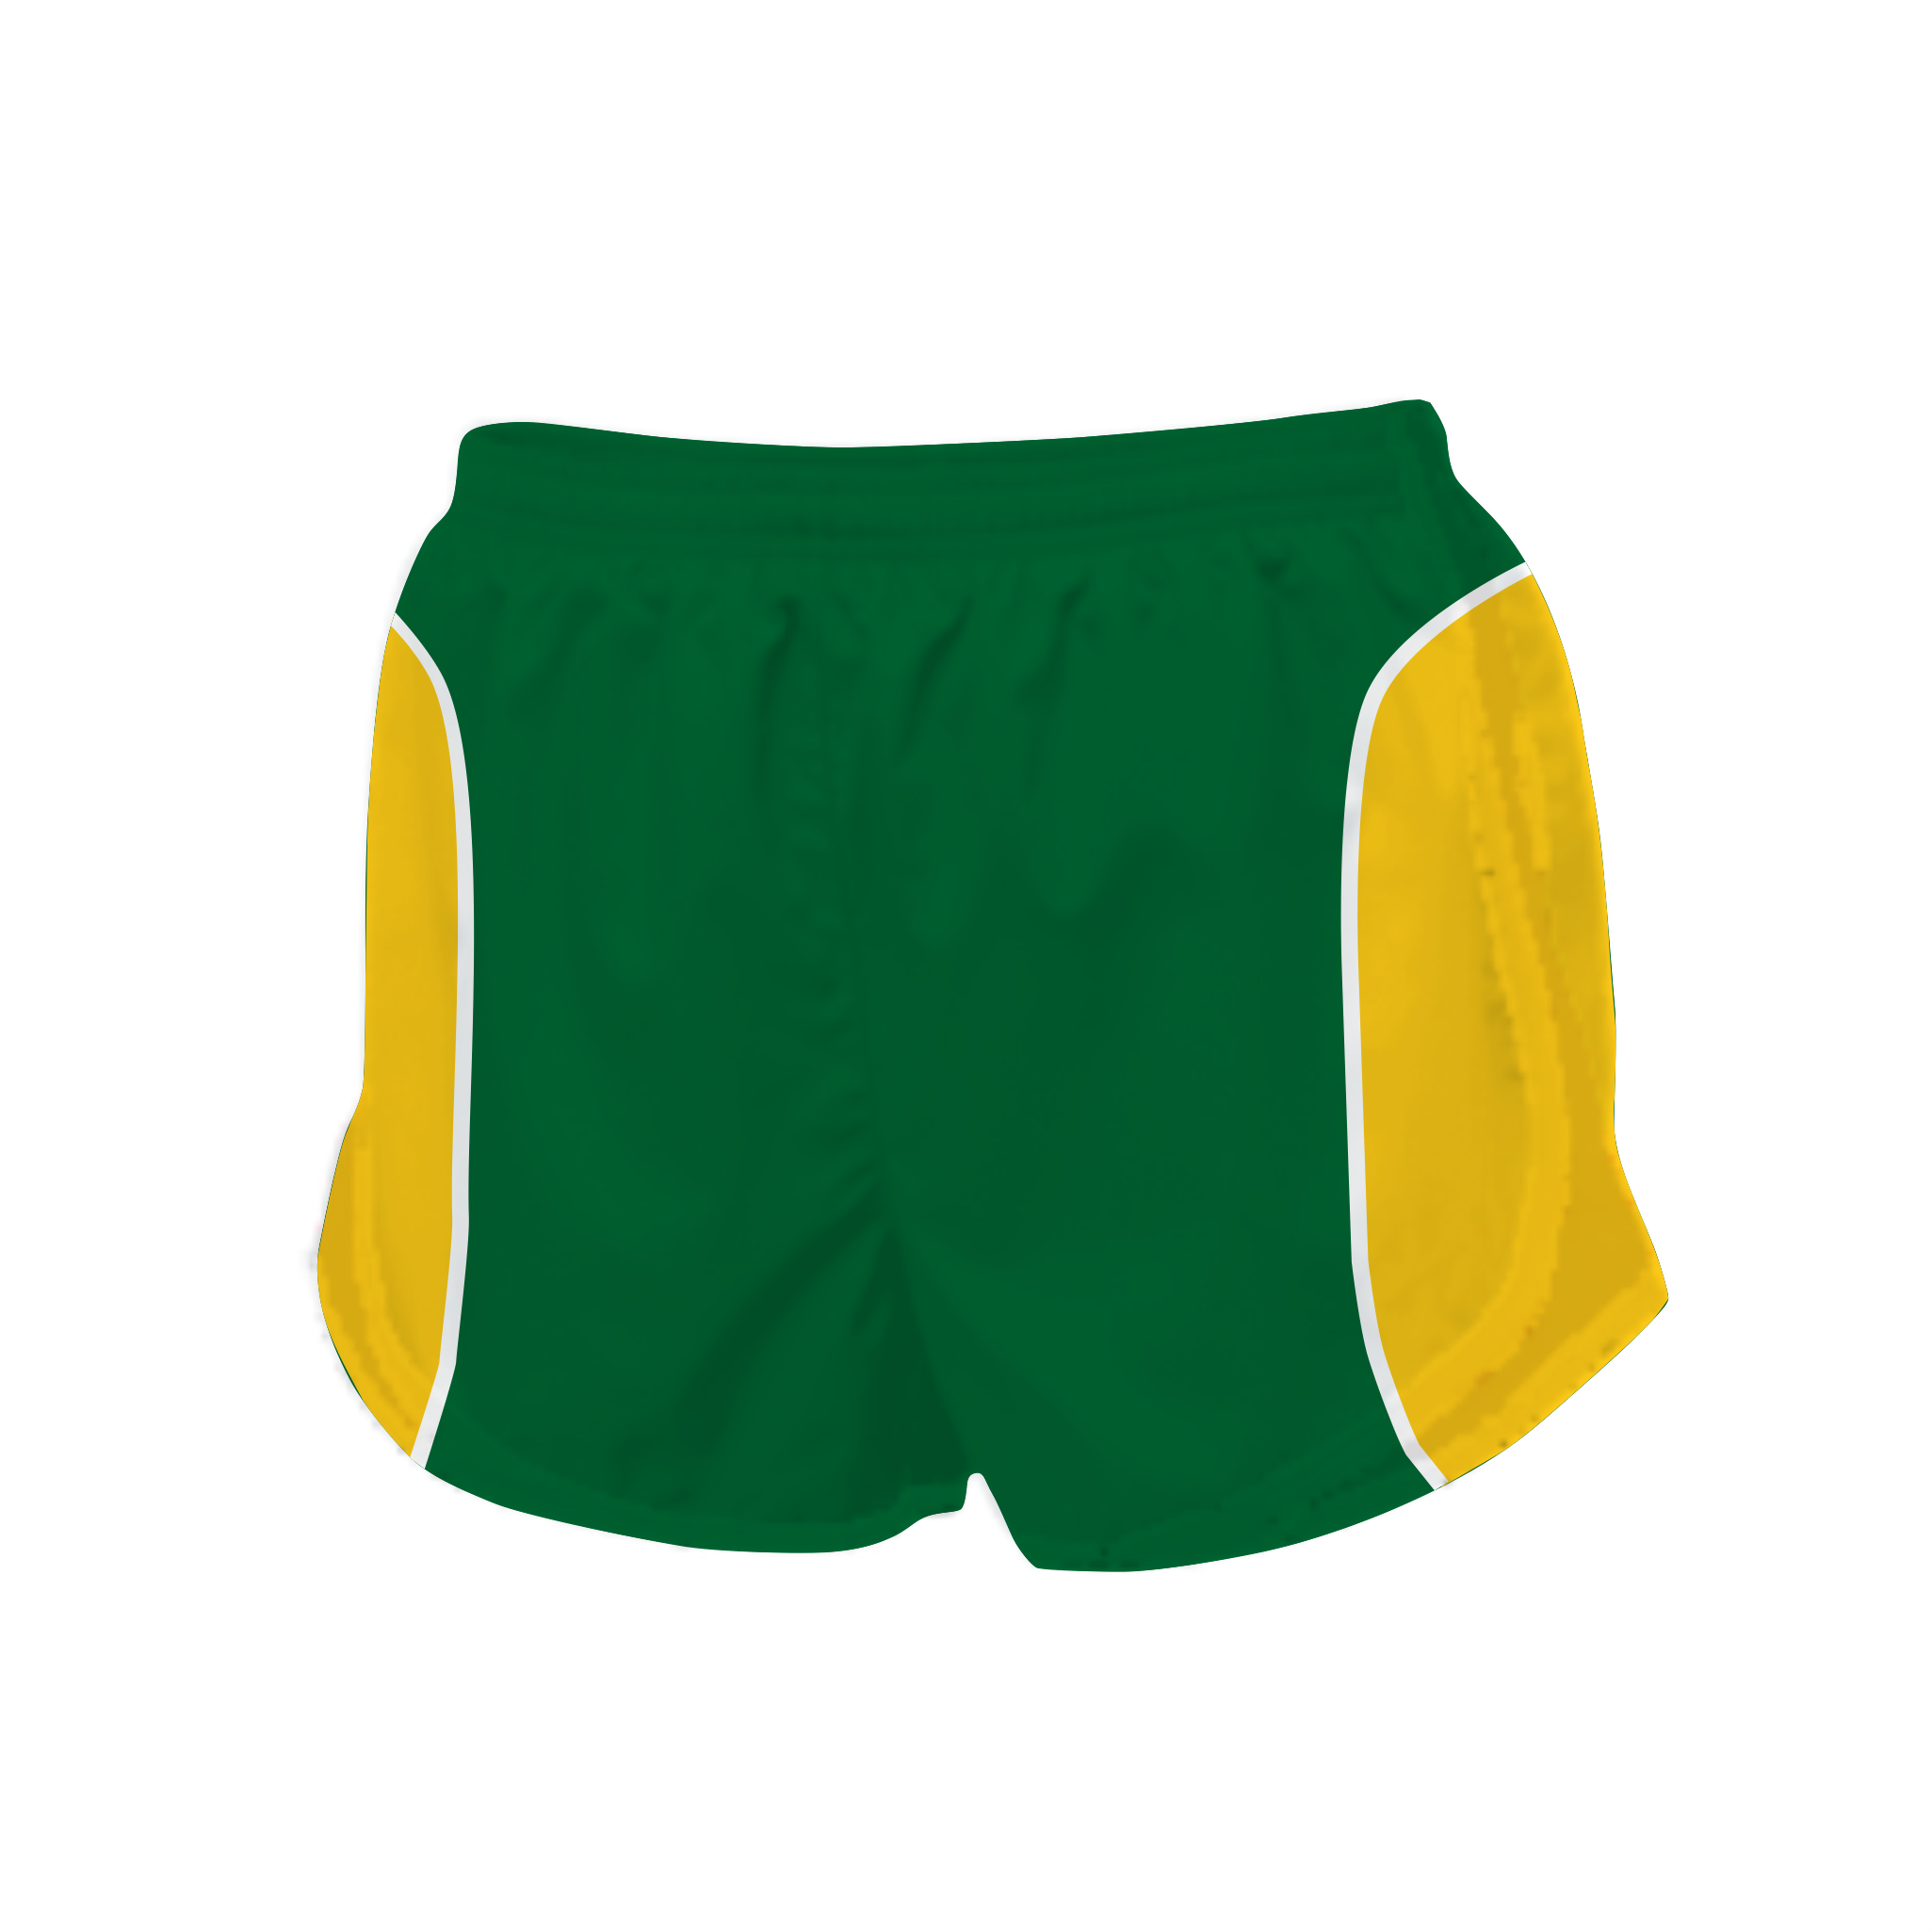 Panelled Zuco running shorts - Bolt